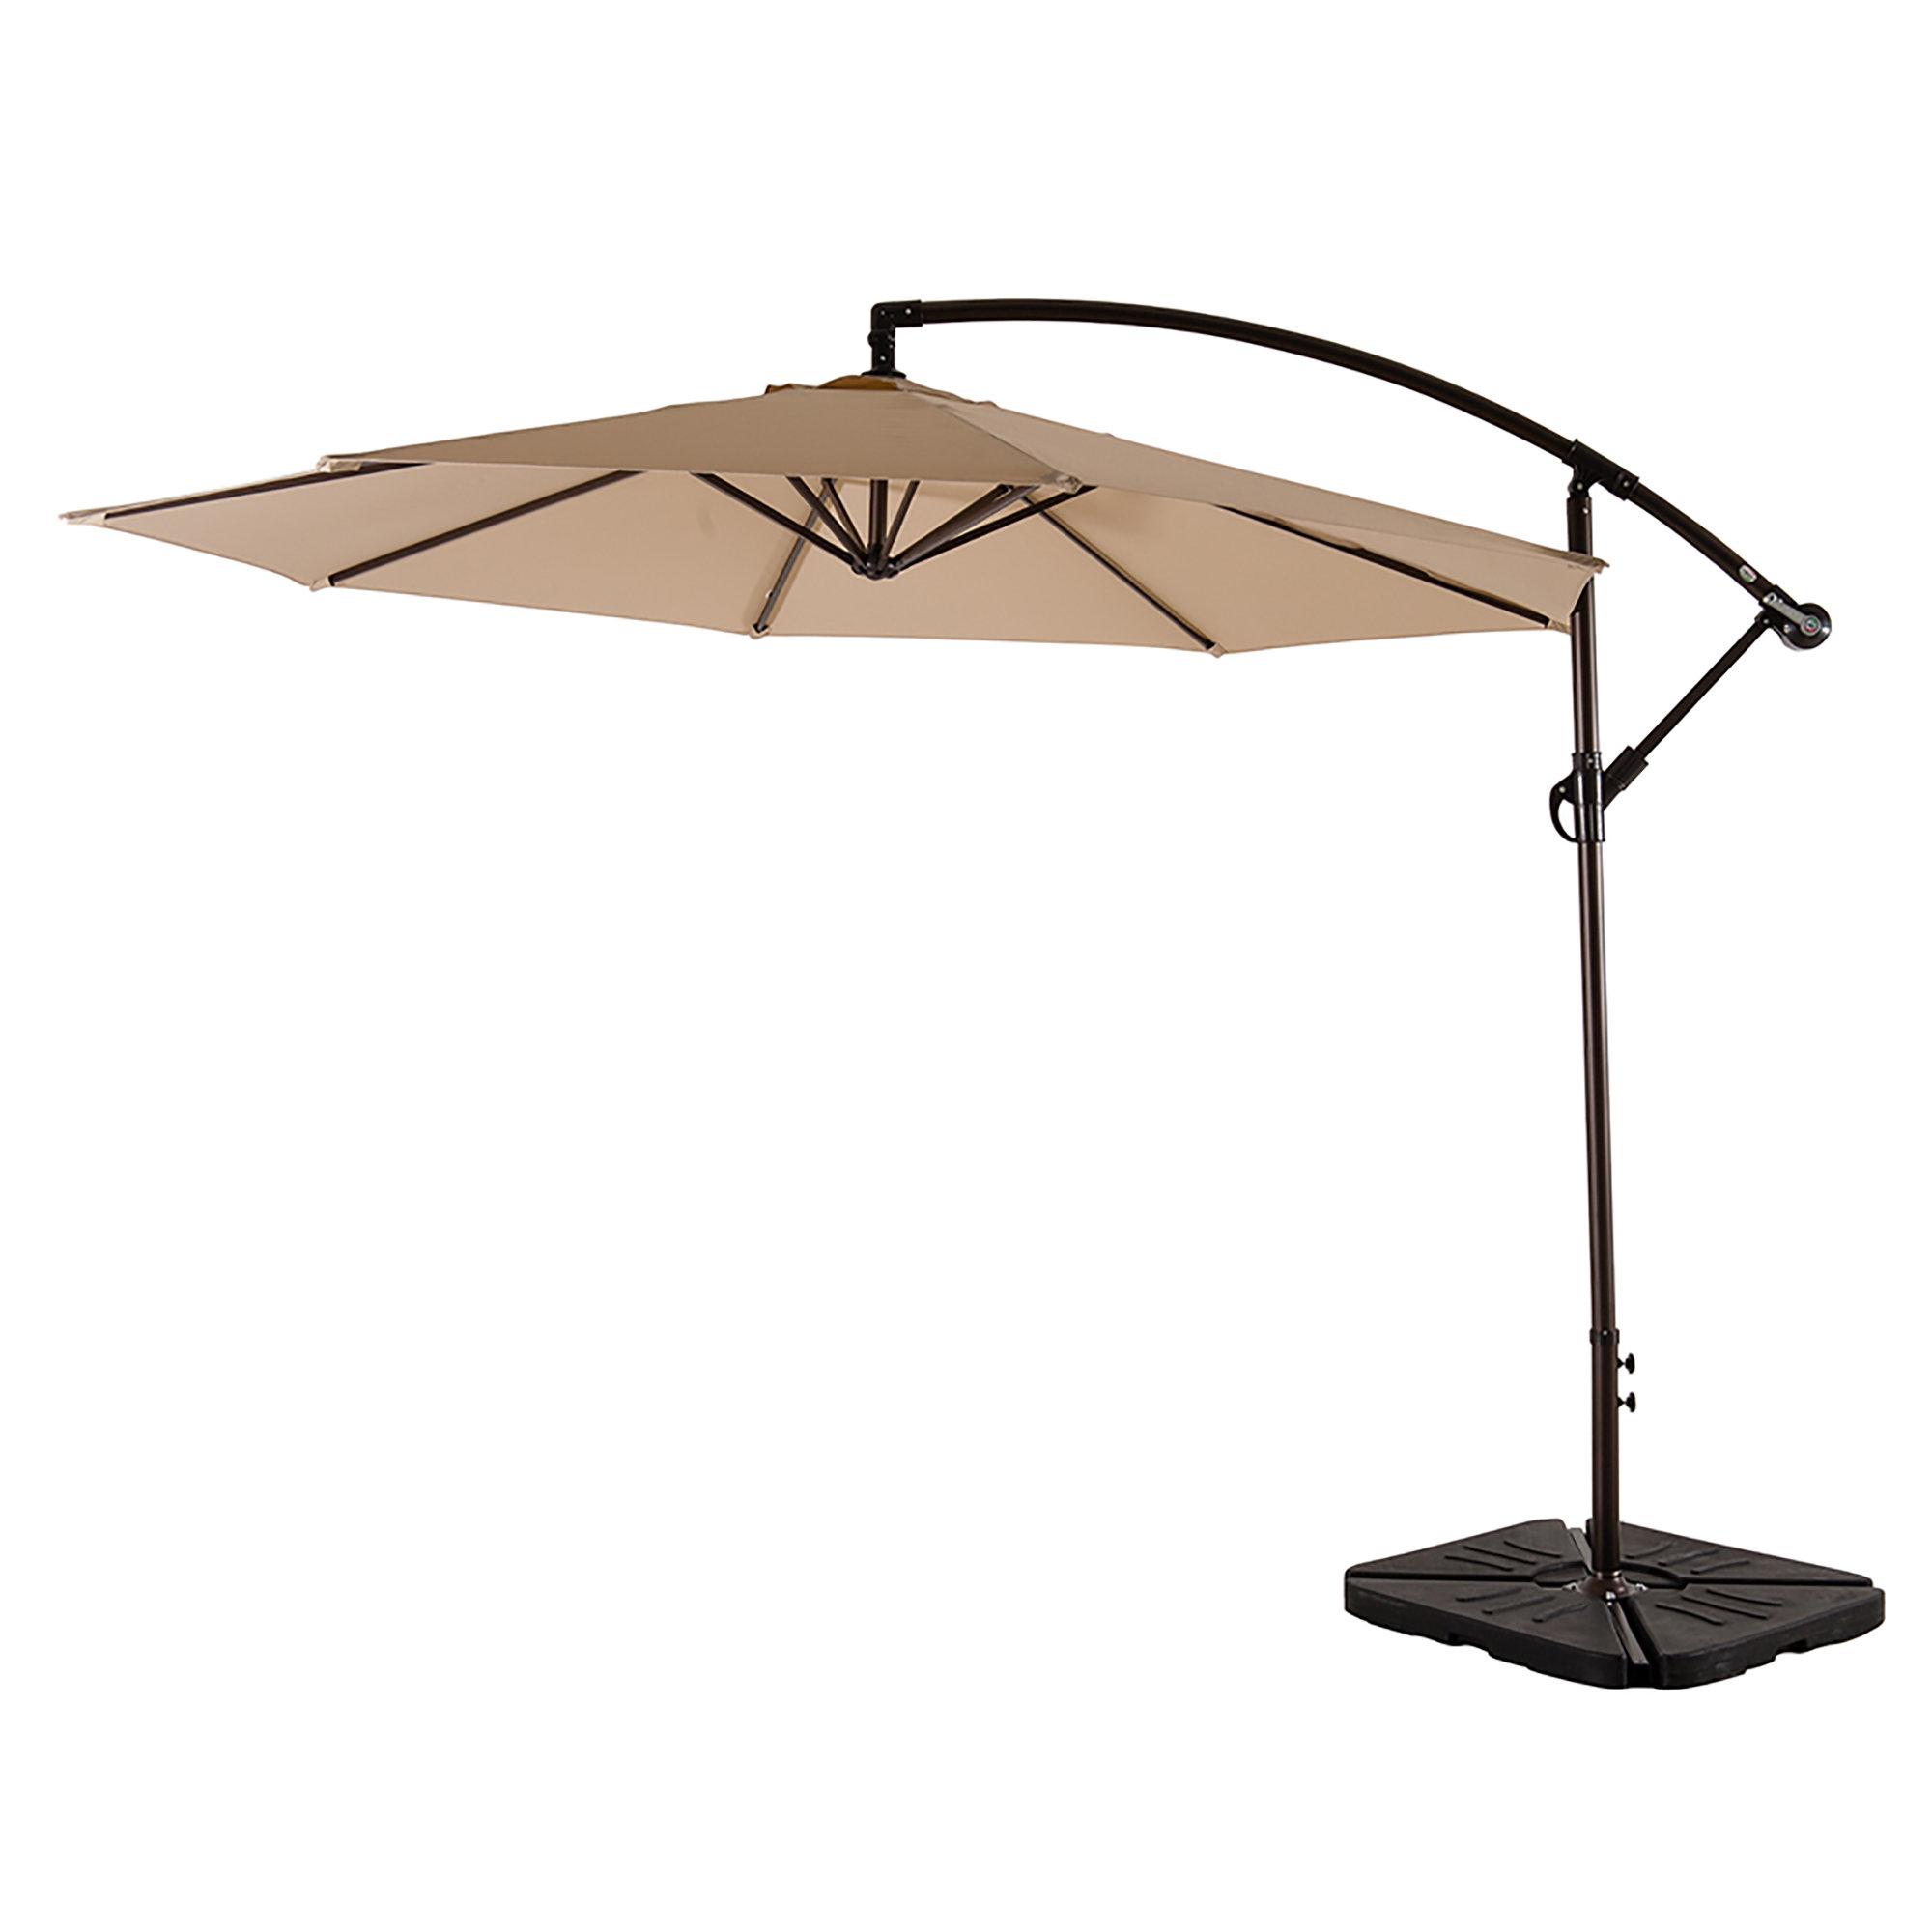 2020 Yajaira Cantilever Umbrellas Regarding Kizzie Market 10' Cantilever Umbrella (View 2 of 20)